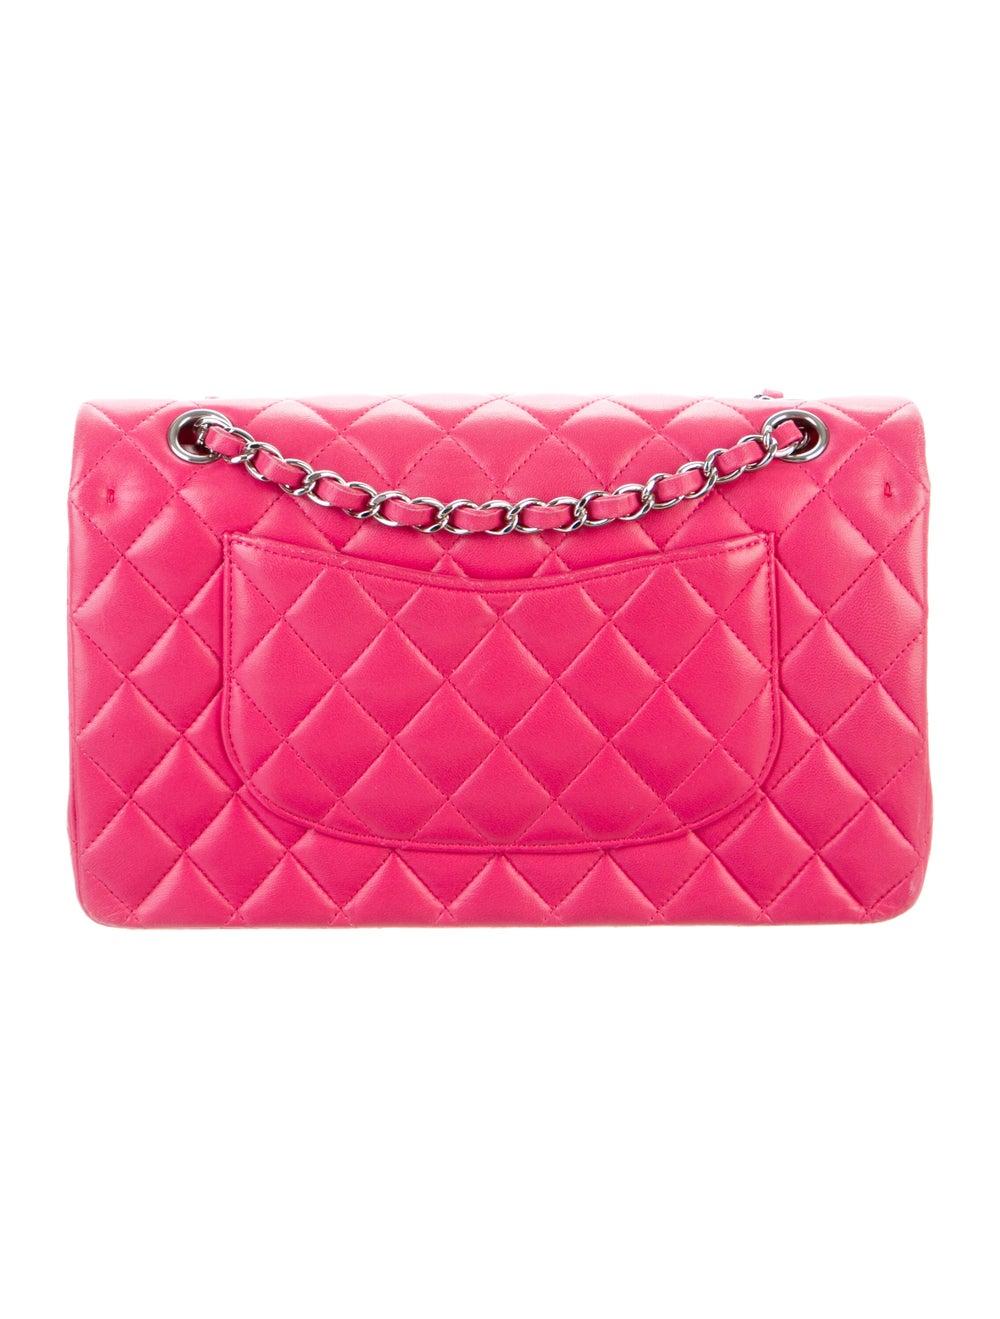 Chanel Classic Medium Double Flap Bag Pink - image 4